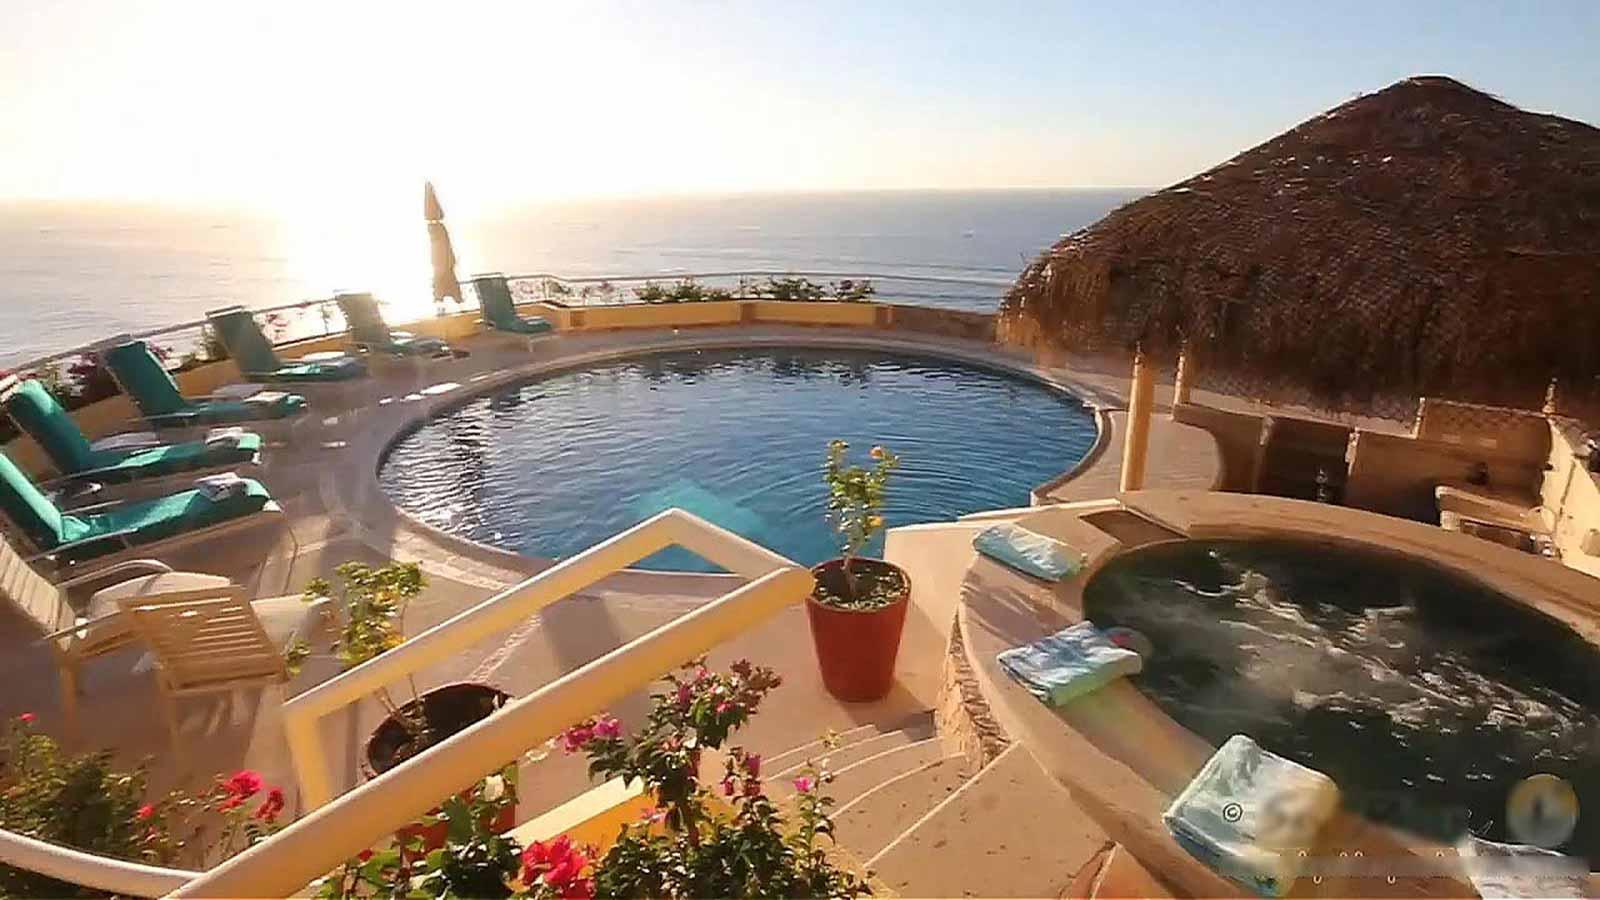 villa-stein-cabo-pool-view-02b